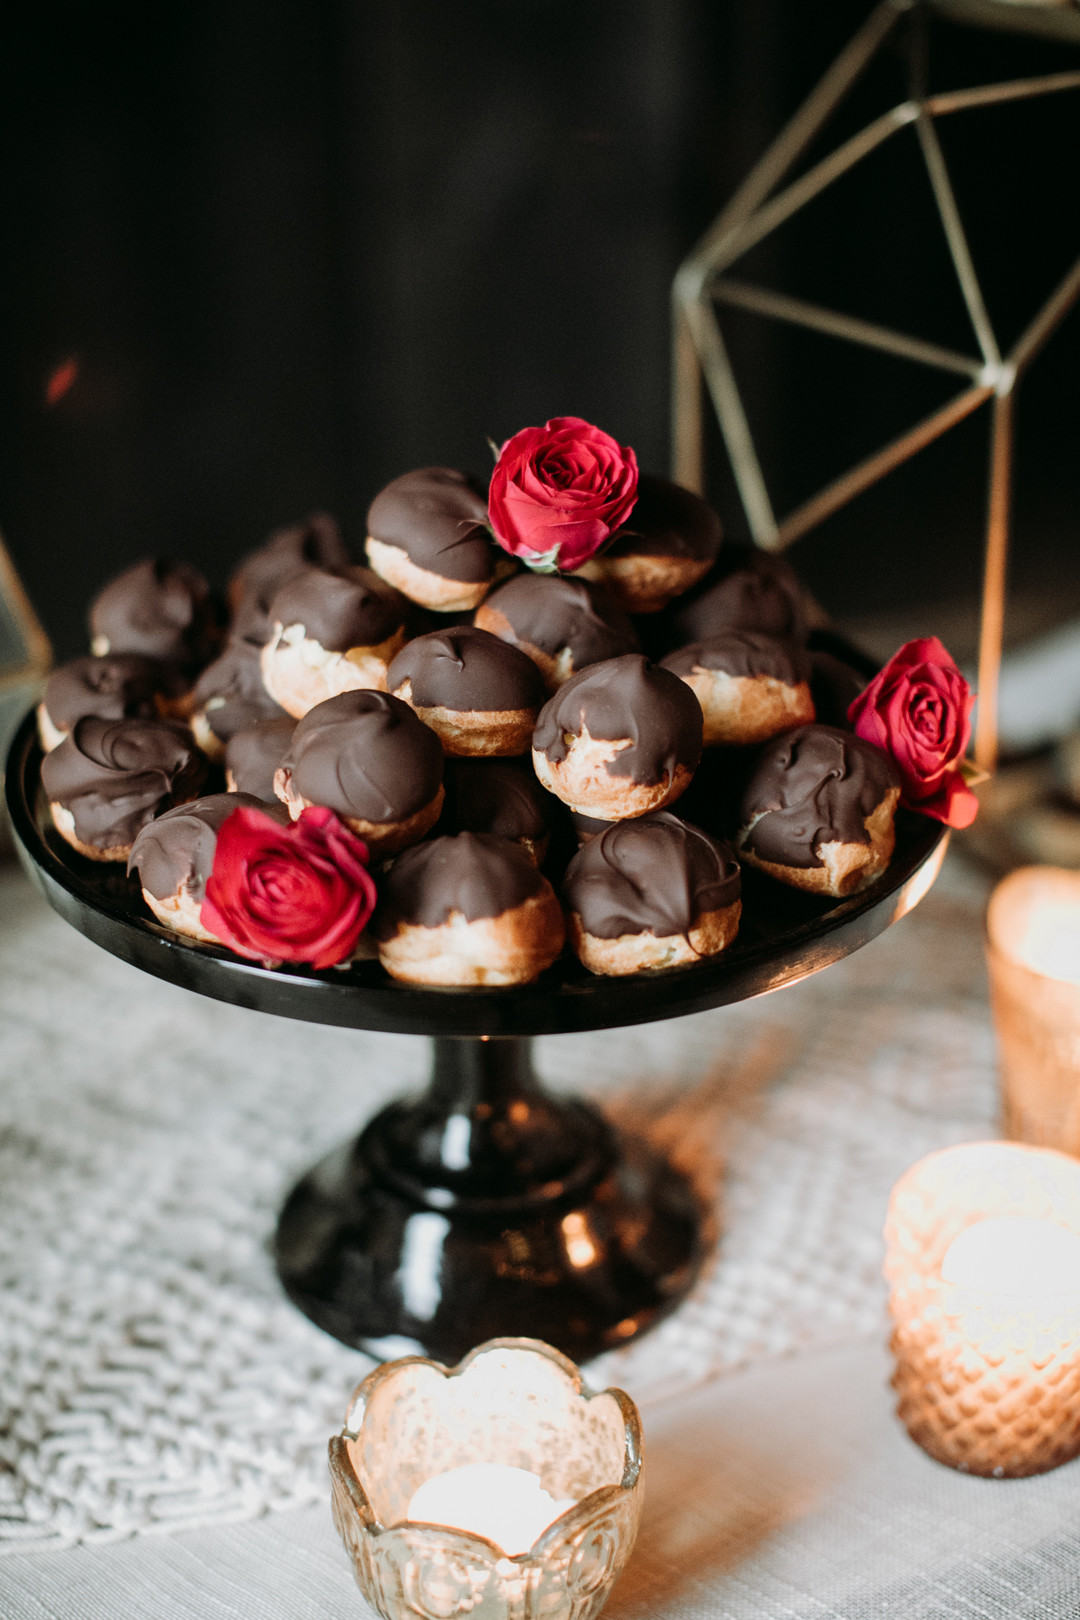 www.santabarbarawedding.com   Kacie Jones Photography   Dana Powers House   FM Events   S&O Dessert Co   Flourish   Blush Fine Linens   Embellish Vintage Rentals   All About Events   dessert